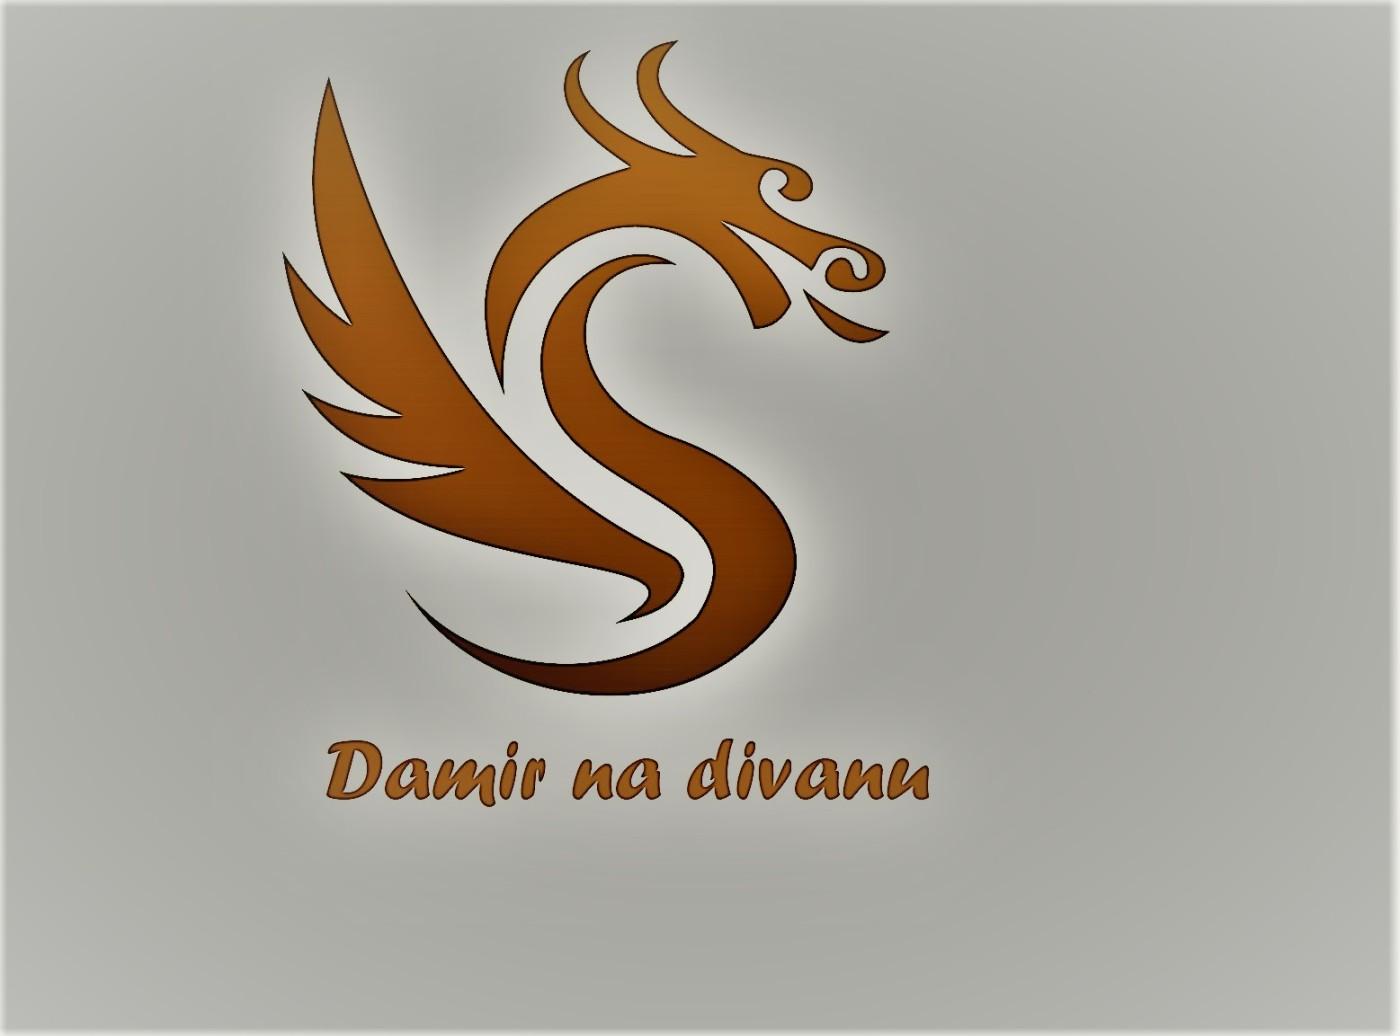 luxury dragon logo design concept template